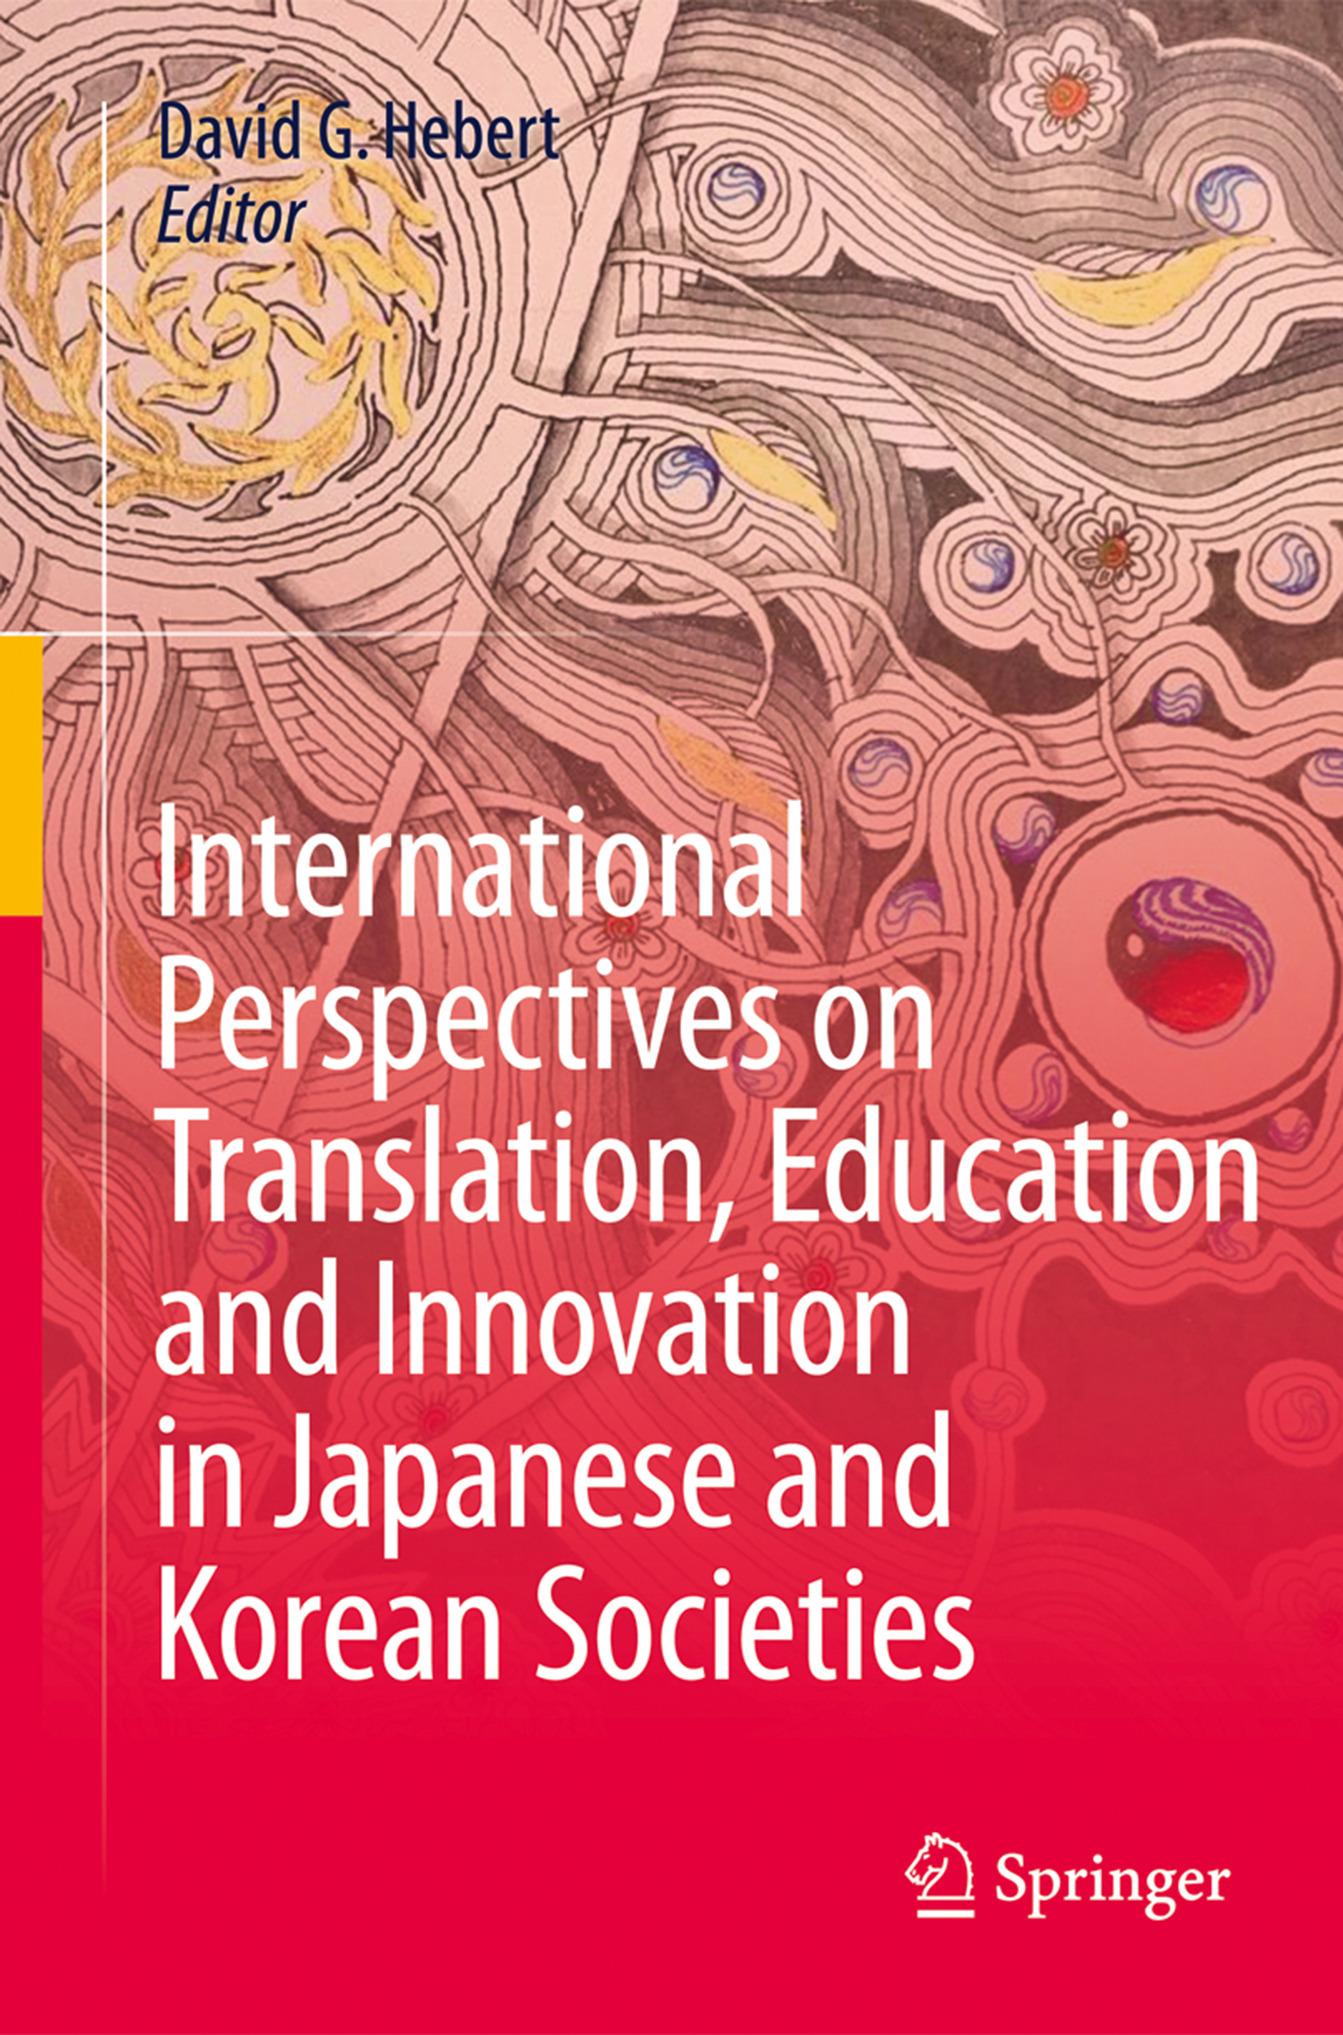 Hebert, David G. - International Perspectives on Translation, Education and Innovation in Japanese and Korean Societies, ebook